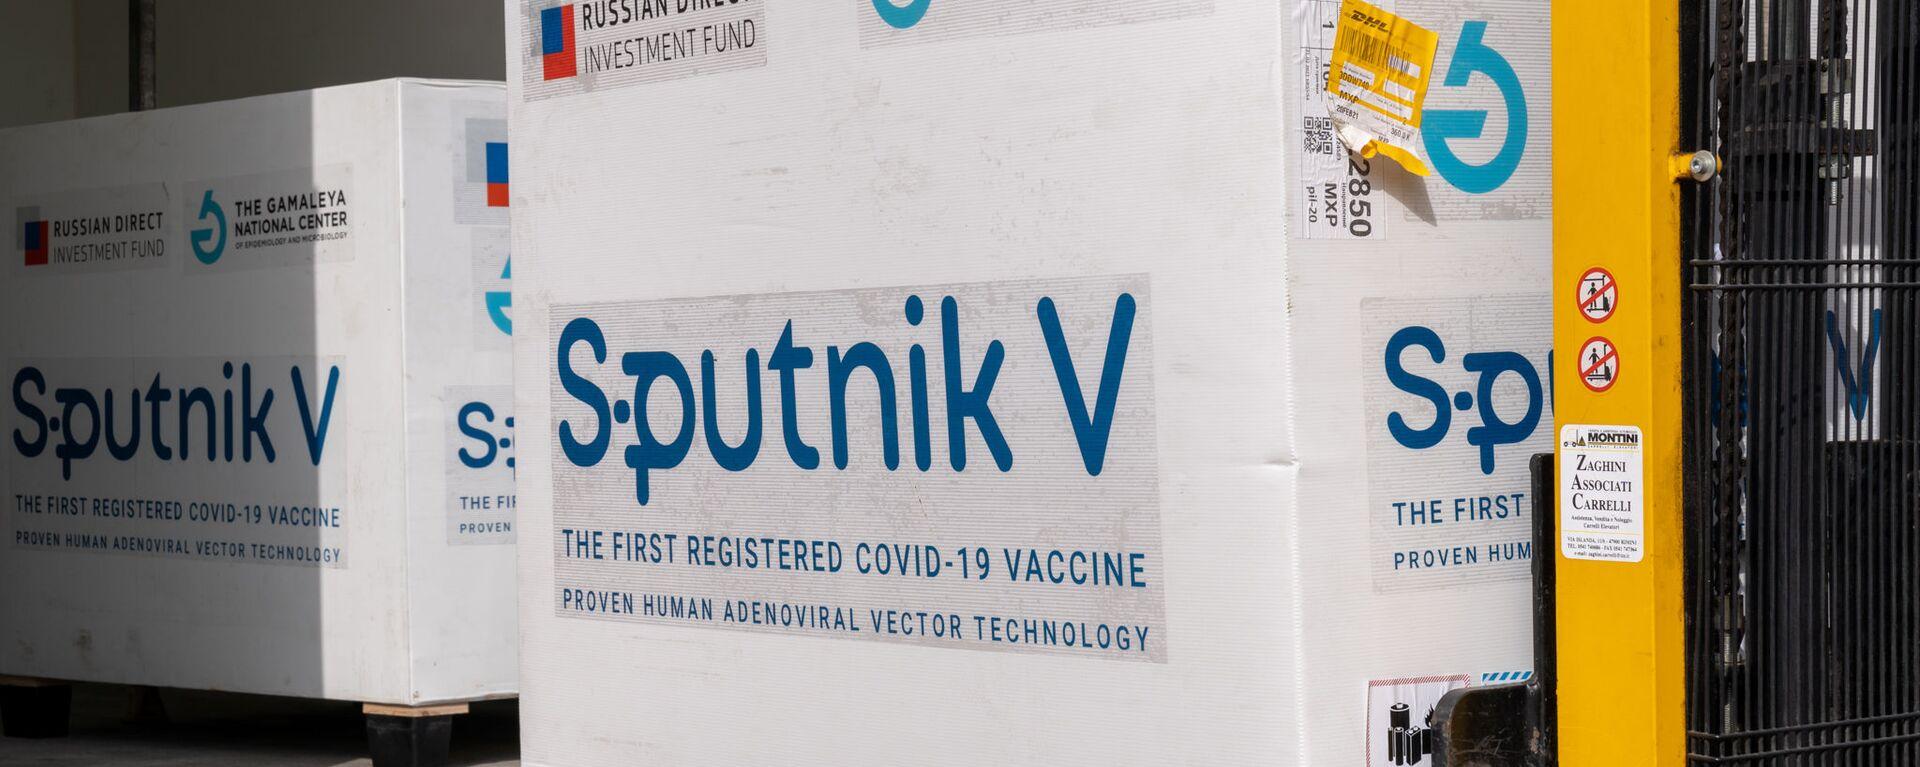 Il vaccino russo, Sputnik V, a San Marino - Sputnik Italia, 1920, 04.06.2021